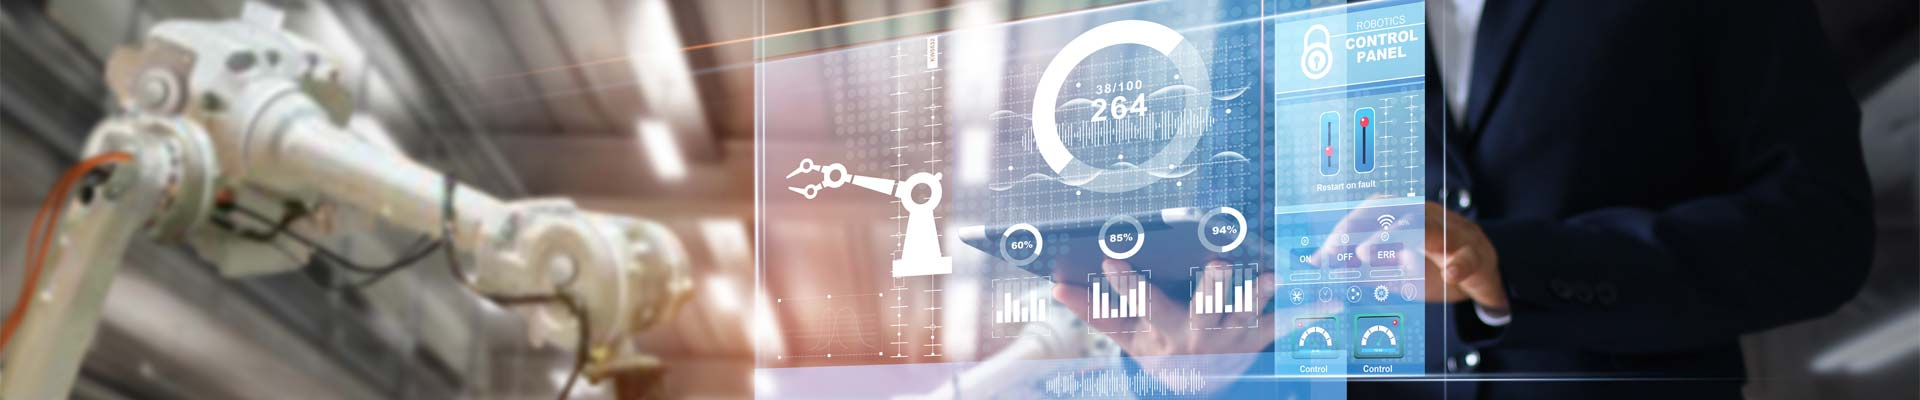 Datengetriebene-Innovationskultur